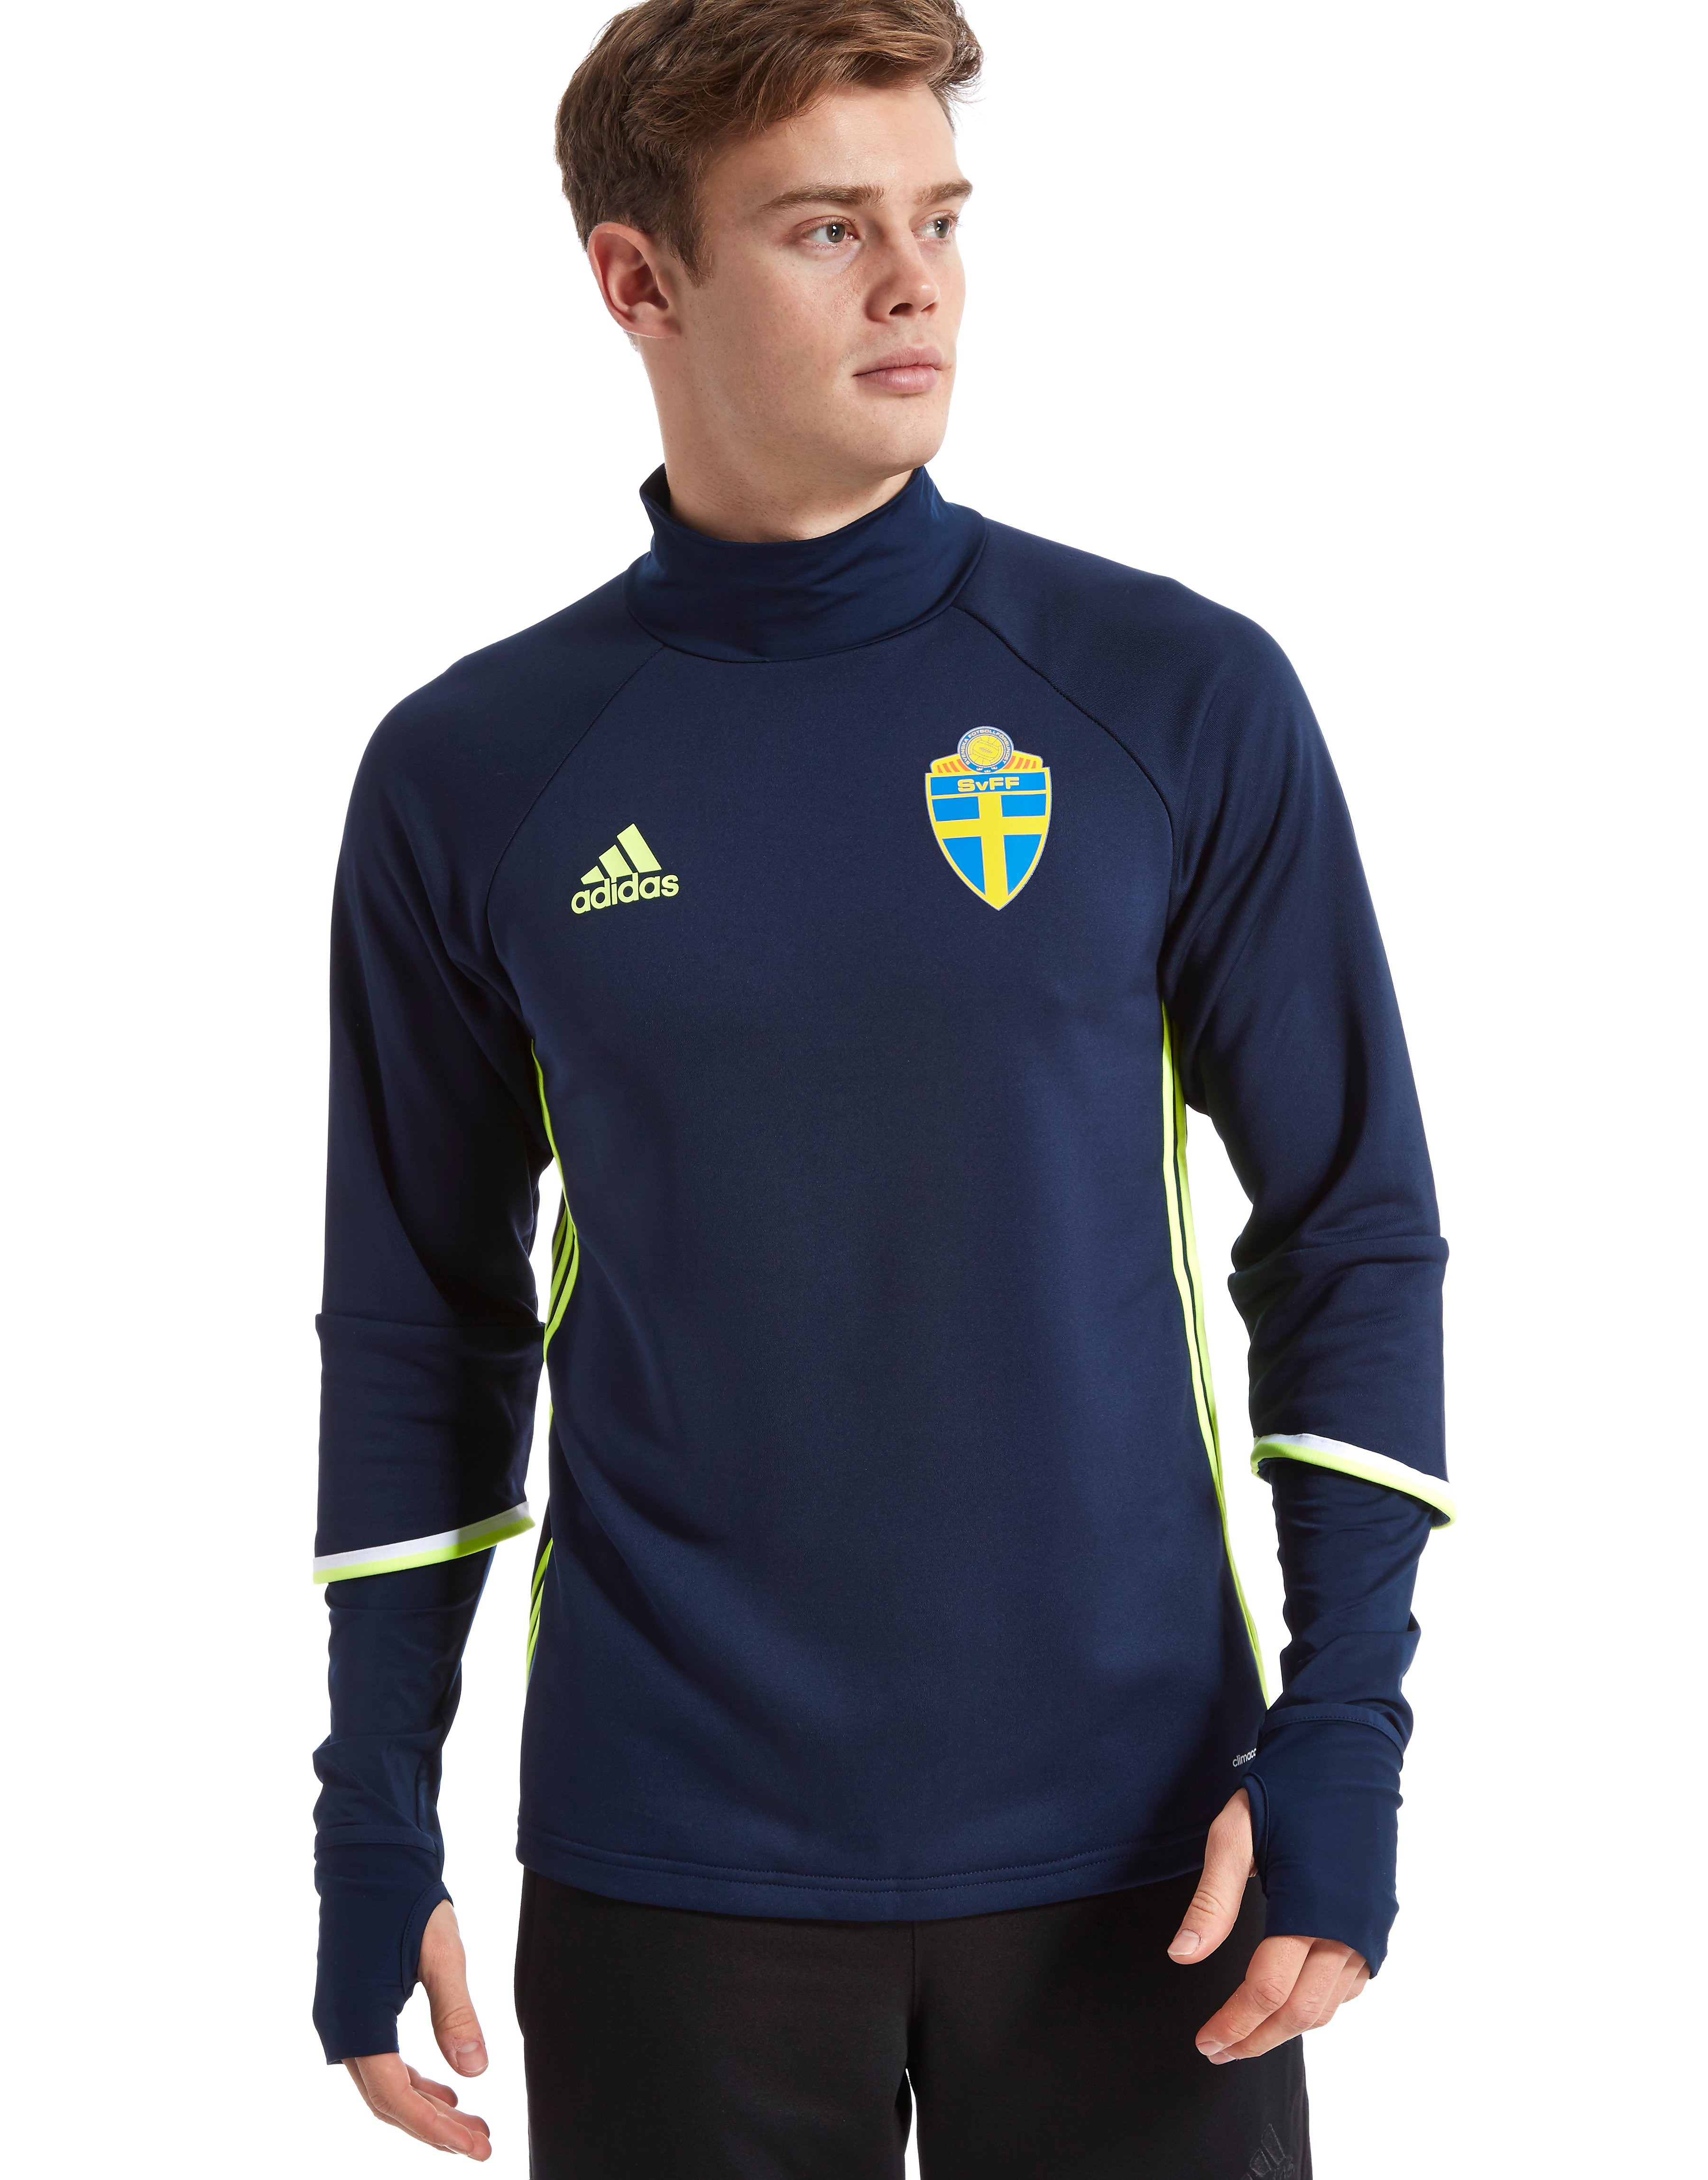 adidas Sweden Training Top